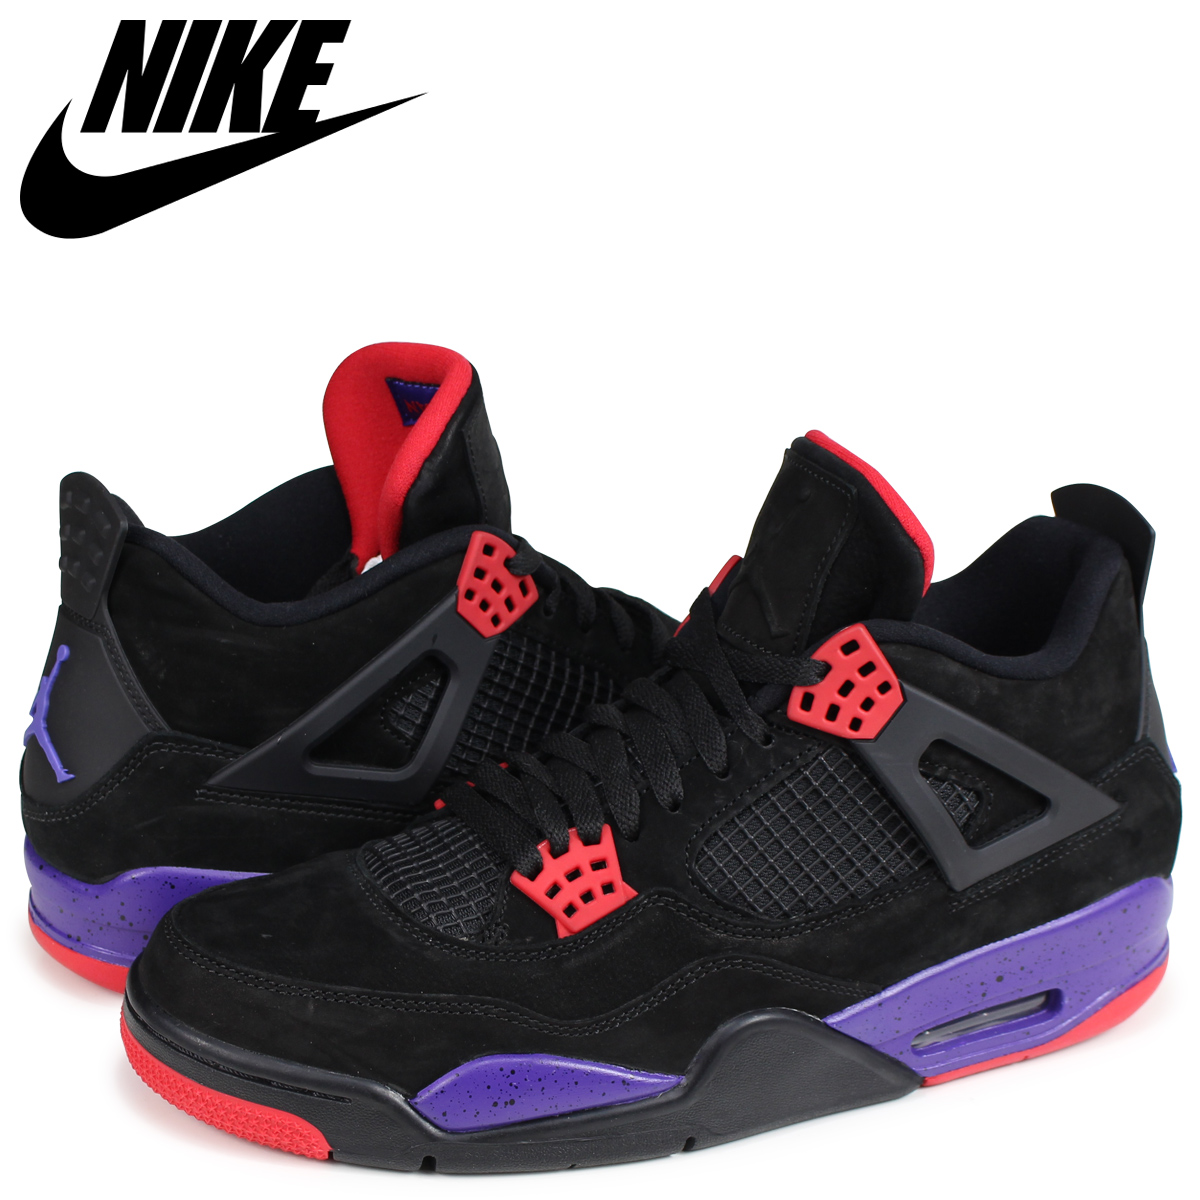 best choice classic many fashionable NIKE AIR JORDAN 4 RETRO NRG RAPTORS Nike Air Jordan 4 nostalgic sneakers  men AQ3816-065 black